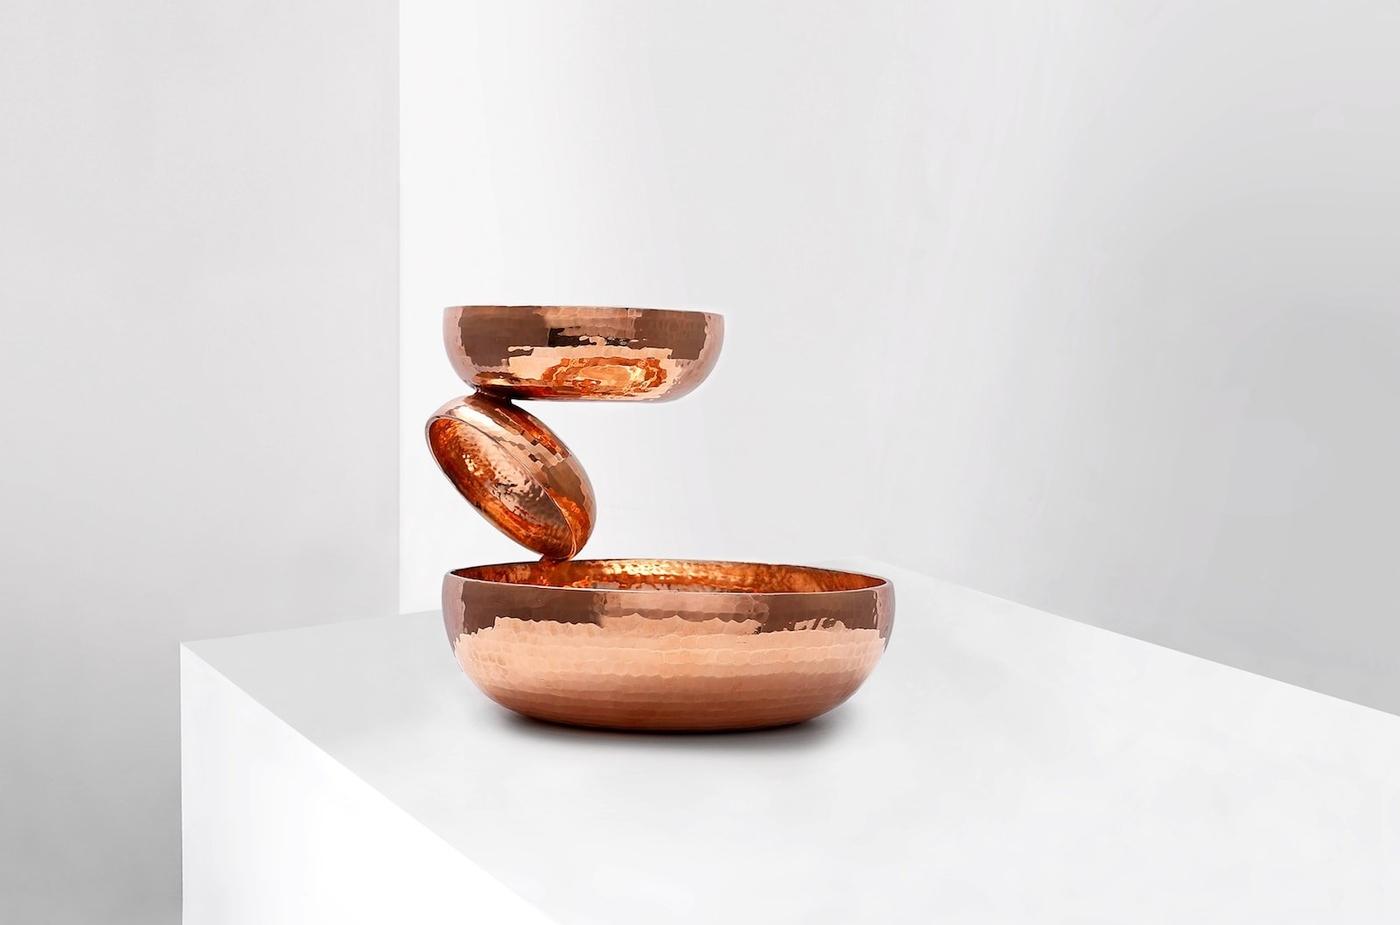 Balance-Joel-Escalona-Minimalissimo-05-1600x1057.jpg